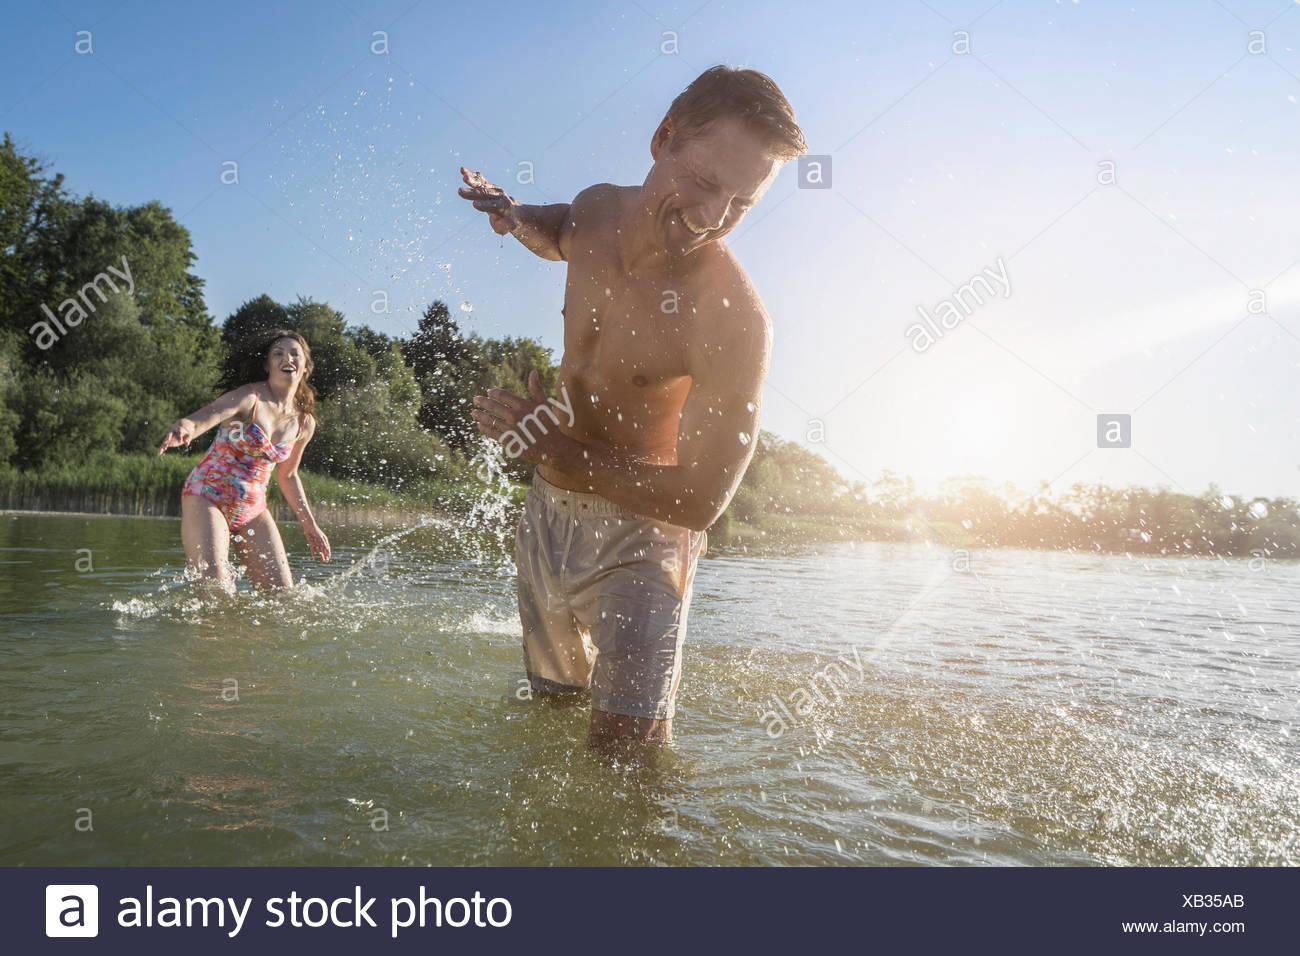 Mature woman splashing water on her husband on lake, Bavaria, Germany - Stock Image